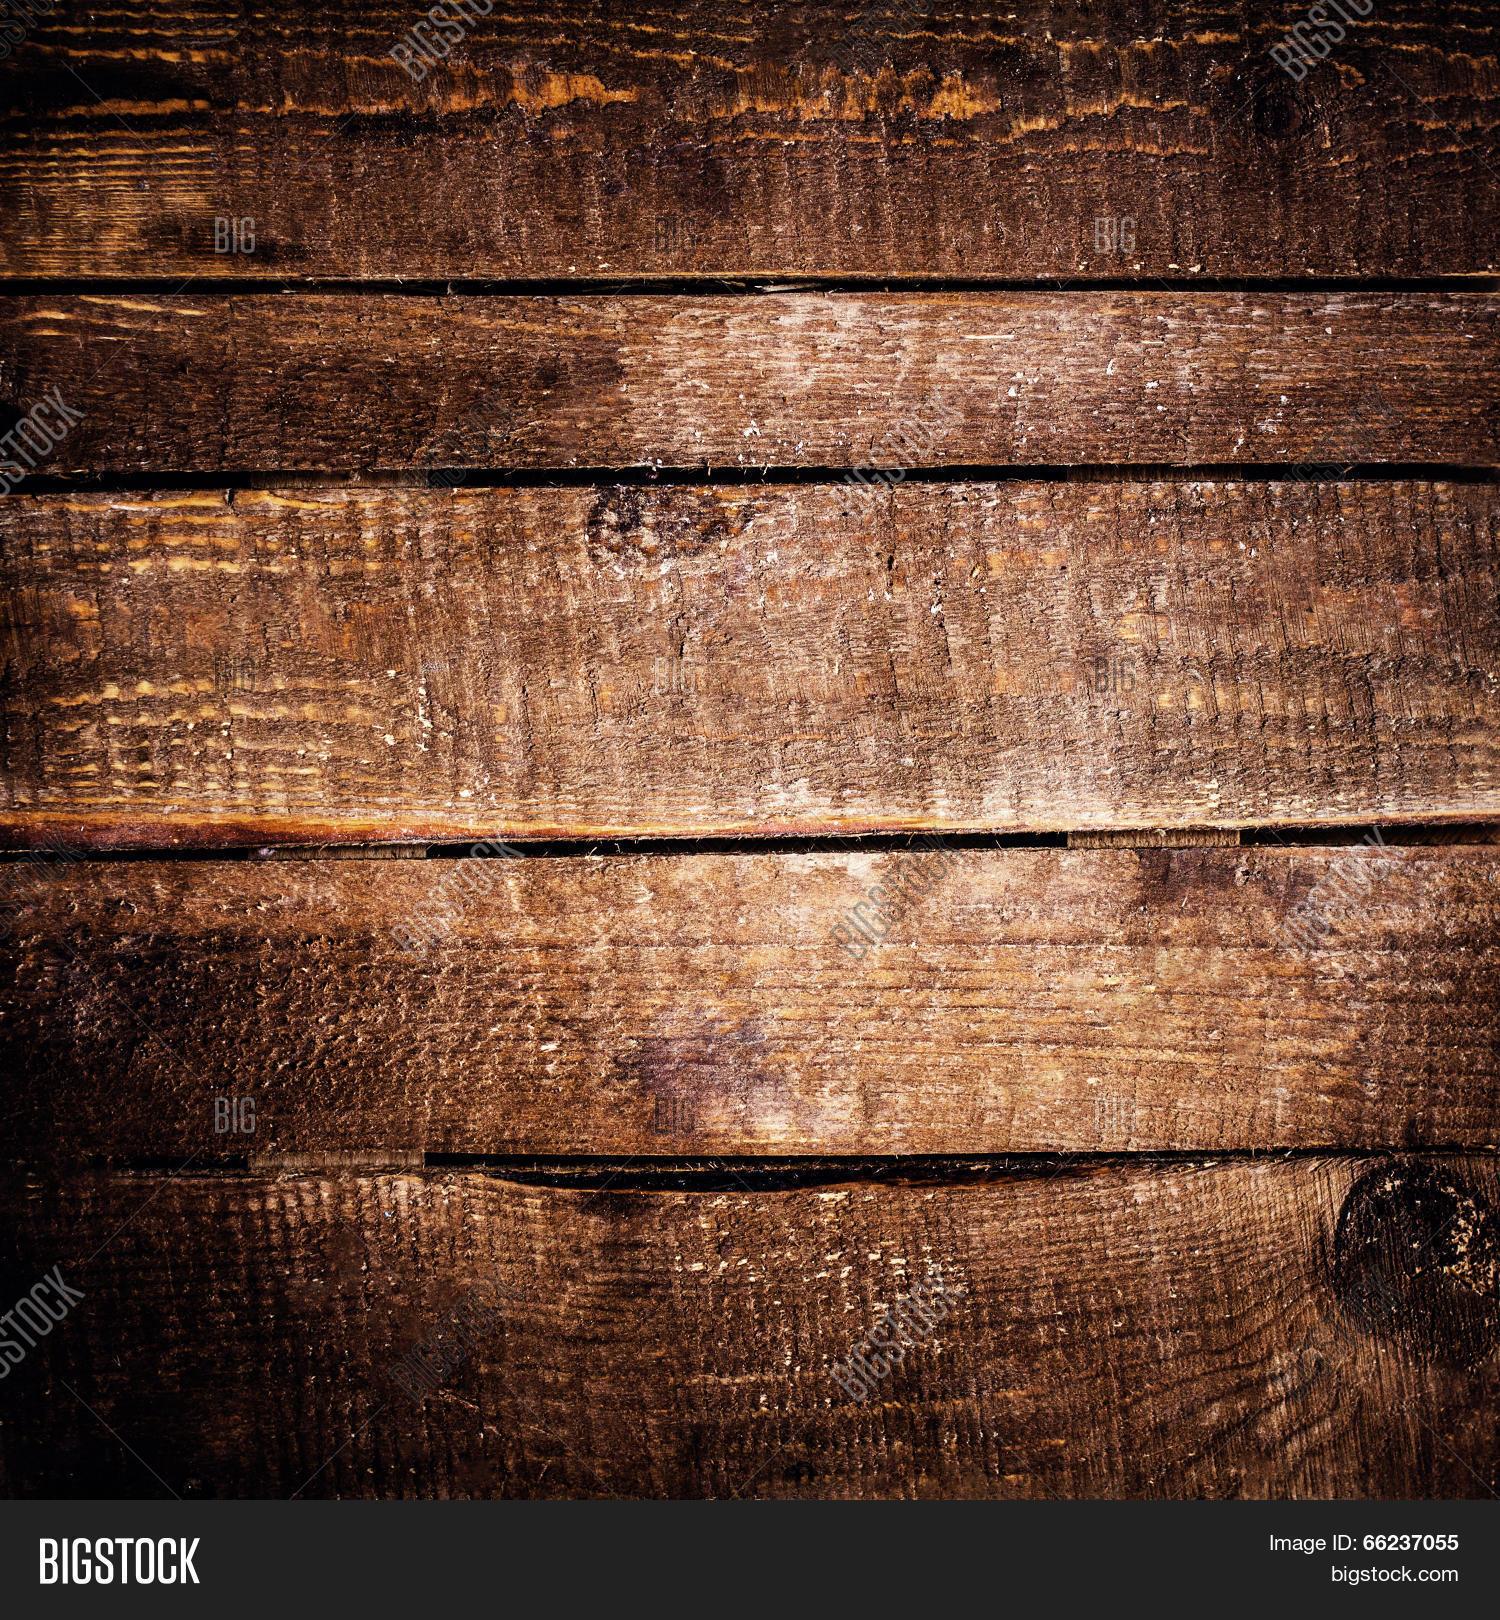 horizontal wood background. Dark Wood Texture. Grunge Wooden Background. Old Textured Table, Horizontal Planks Background B